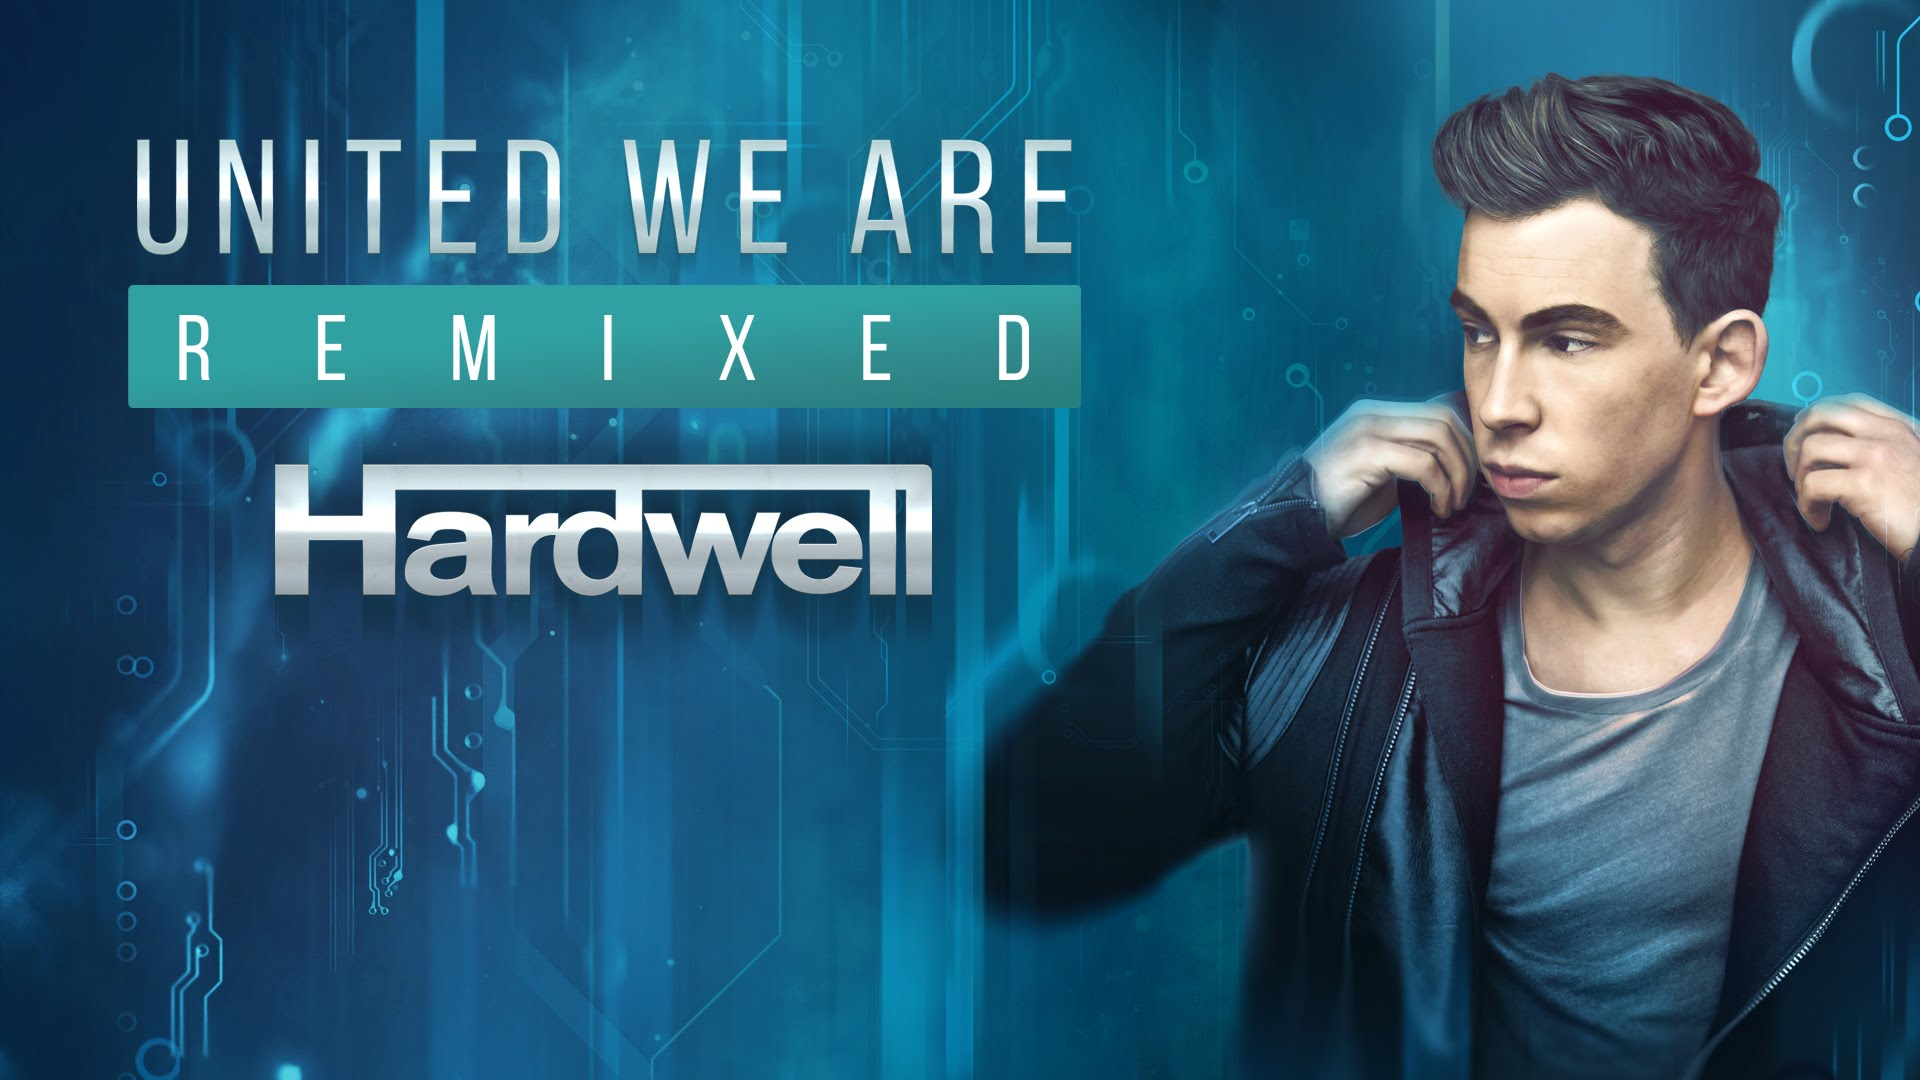 Hardwell - United We Are (Remixed)